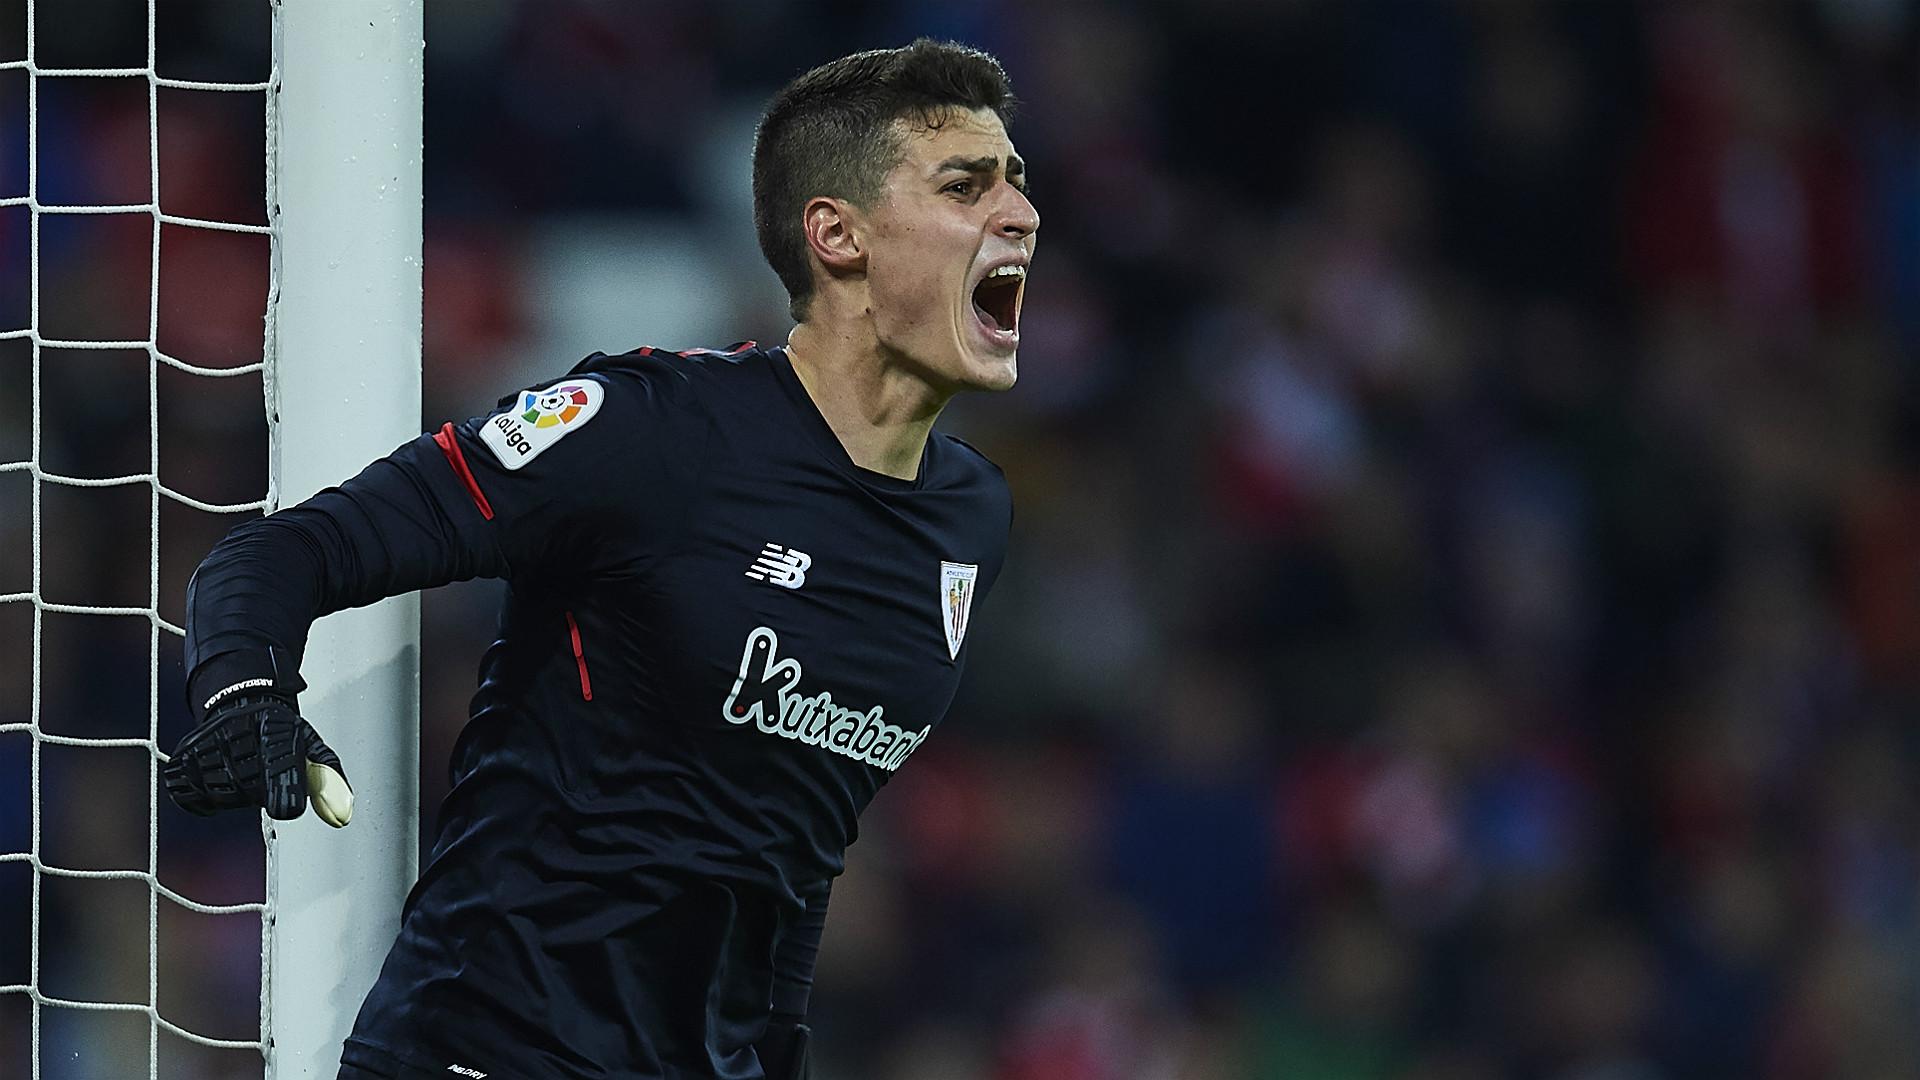 Kepa Arrizabalaga Athletic Bilbao